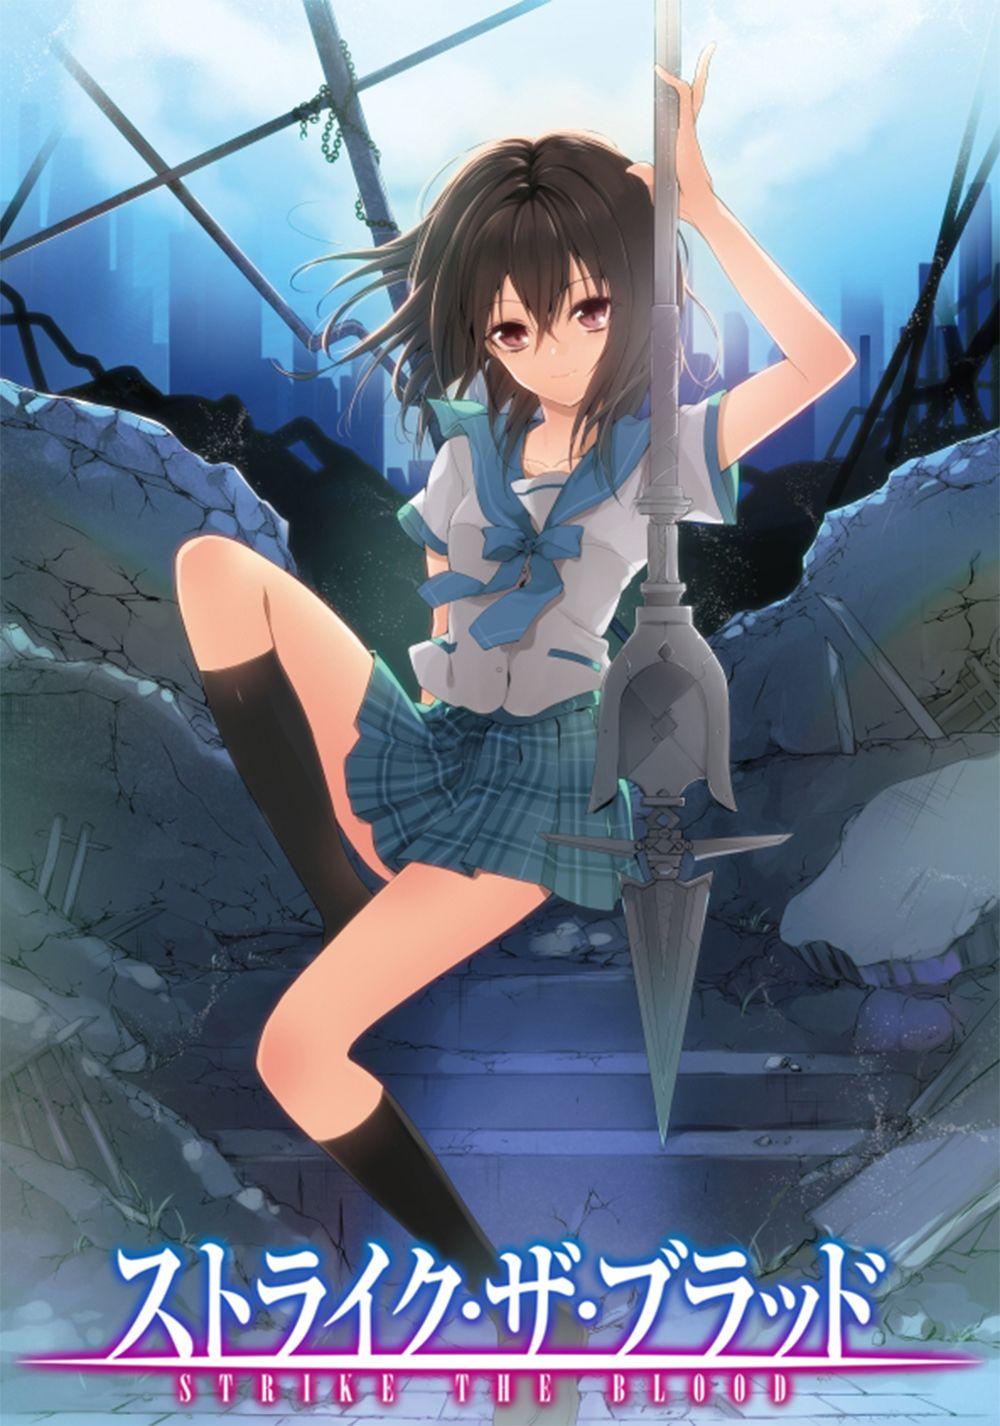 Himeragi Yukina Strike the Blood Blood anime, Strike